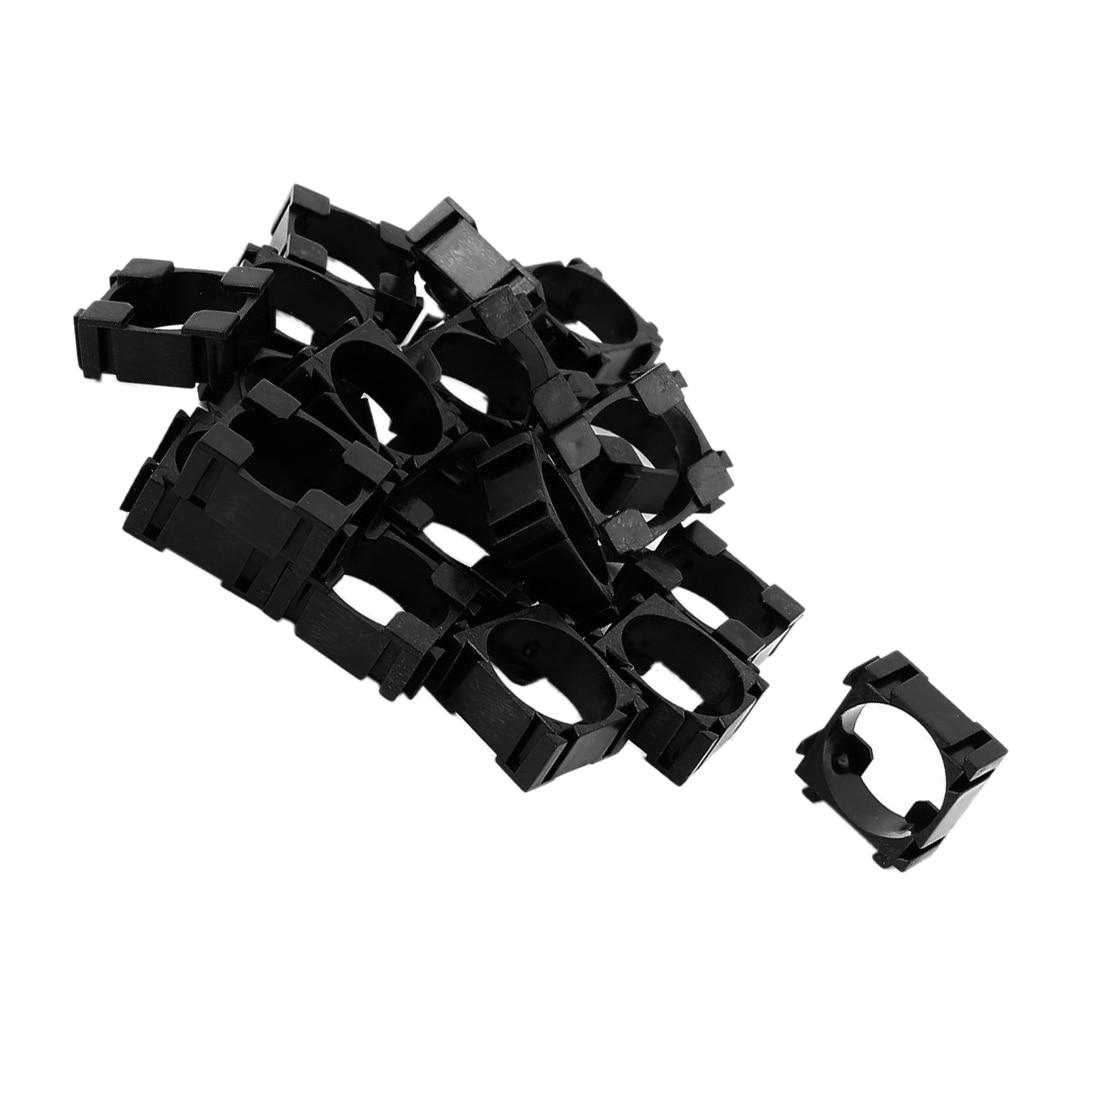 20 шт. 18650 литиевый элемент Батарея держатель кронштейн для DIY Батарея pack